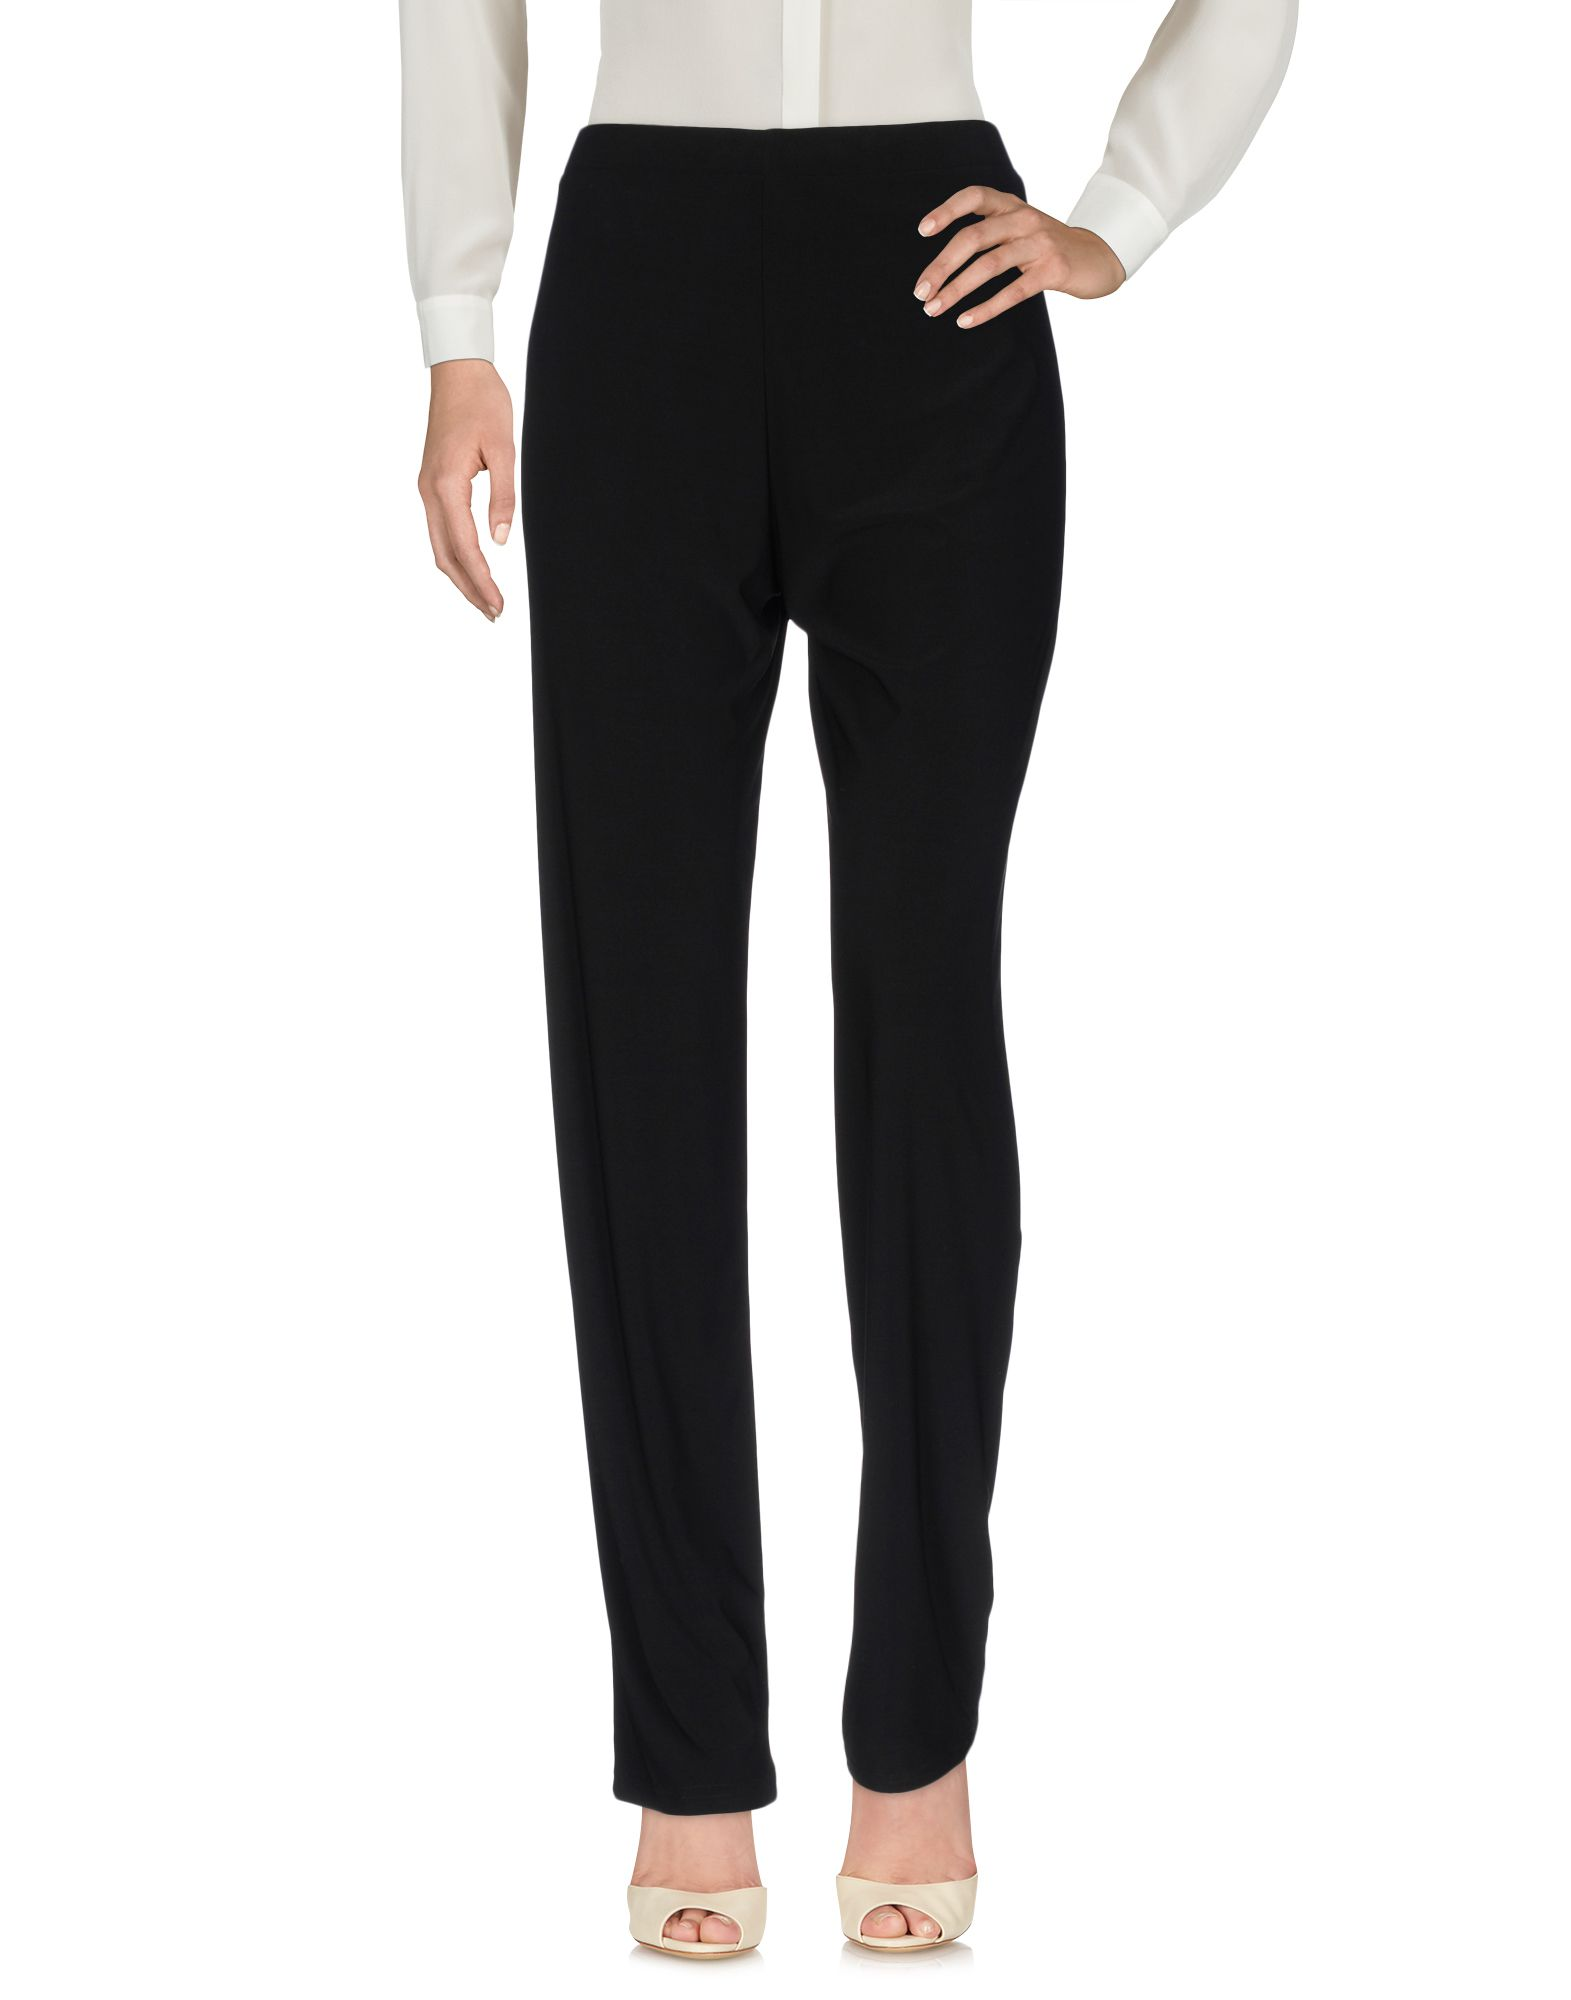 Pantalone Via Stendhal  Roma donna - - 13104325CO  großhandel billig